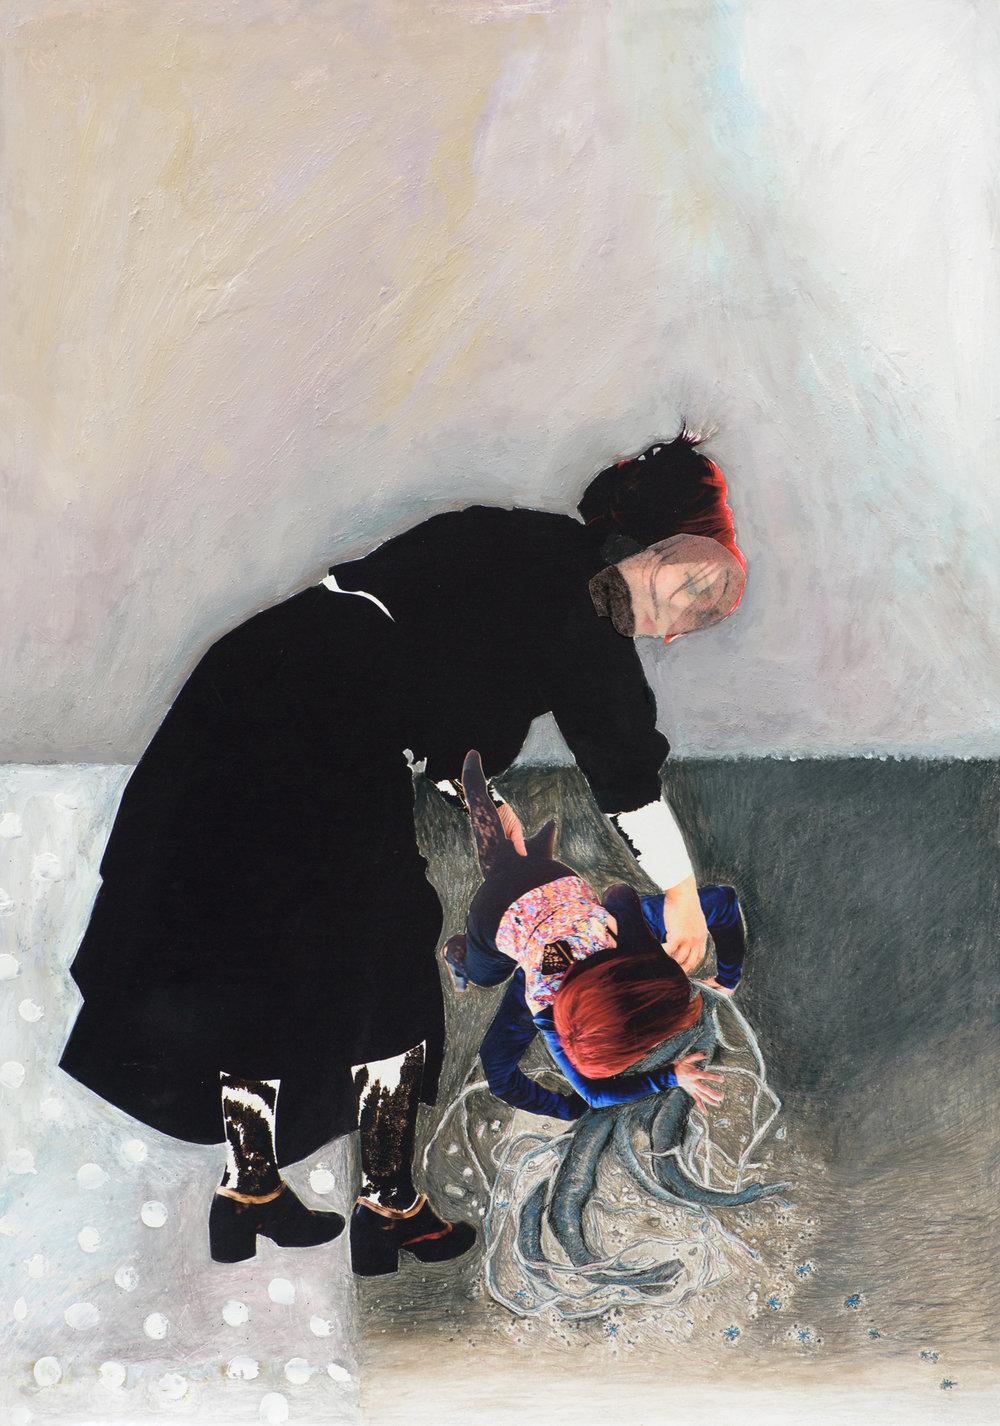 Image: Silvia Sellitto, Uprooting myself, mixed media on Hahnemuhle Rag, 2016